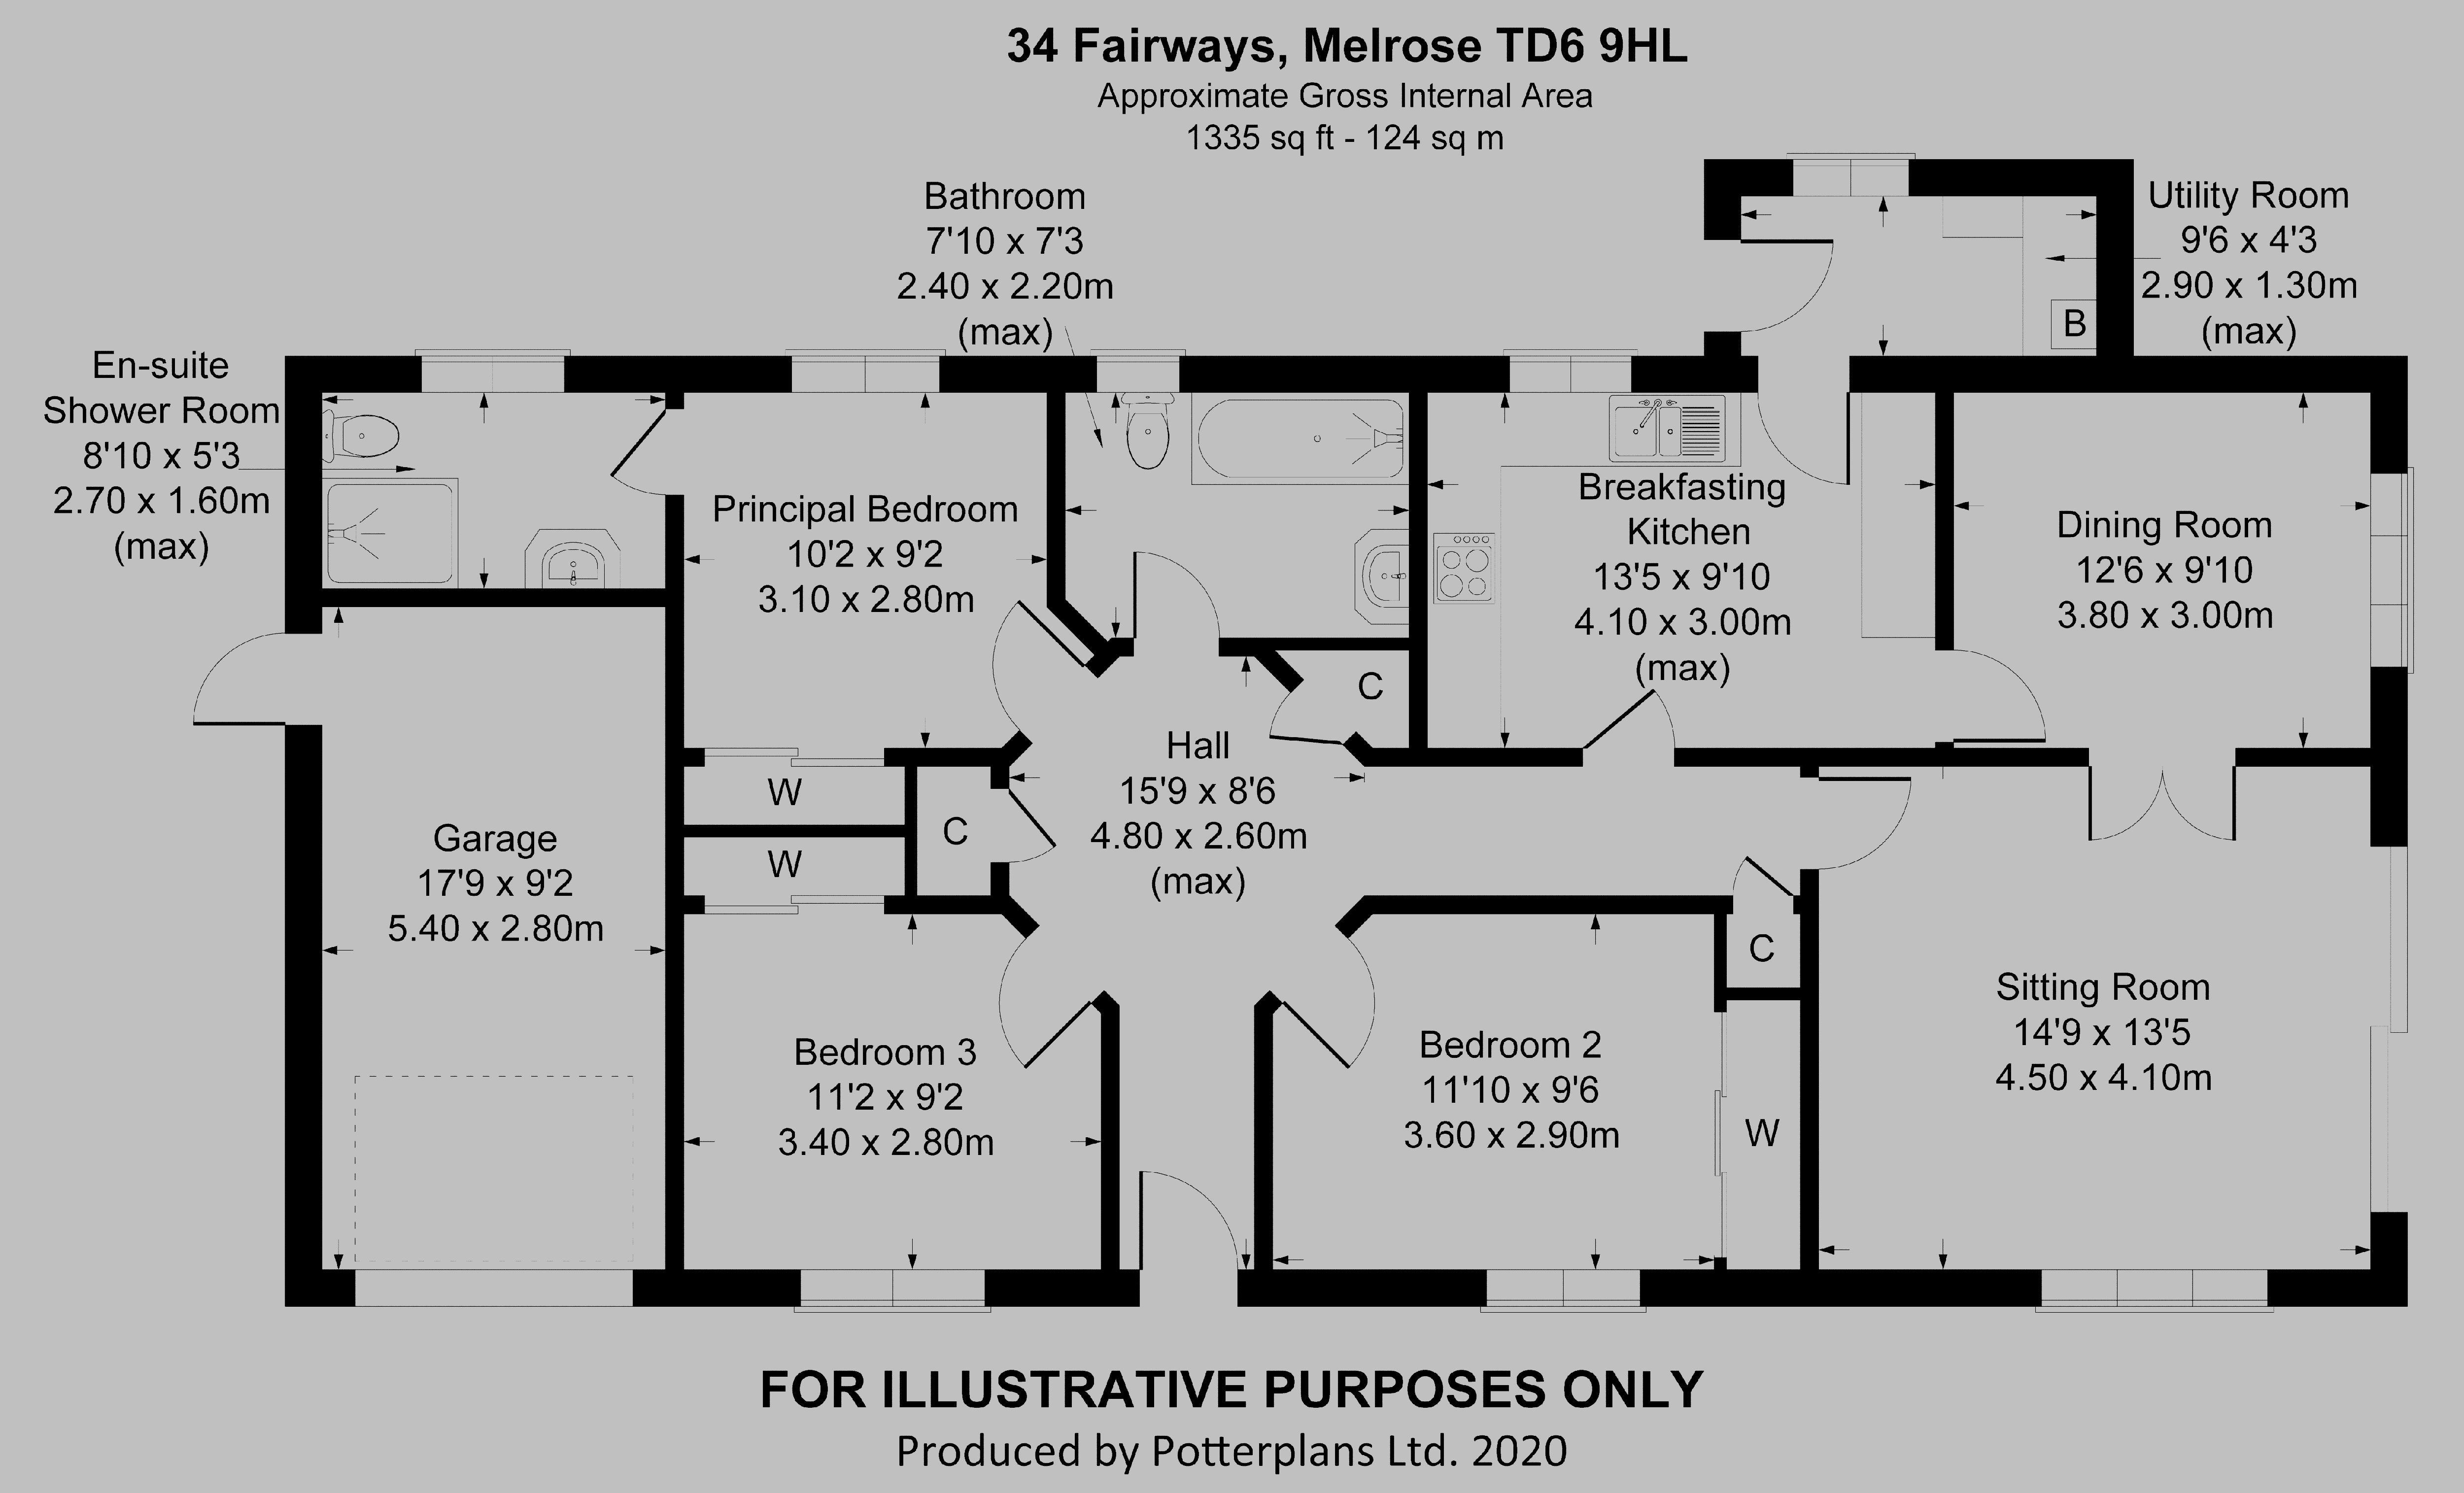 34 Fairways Ground Floor